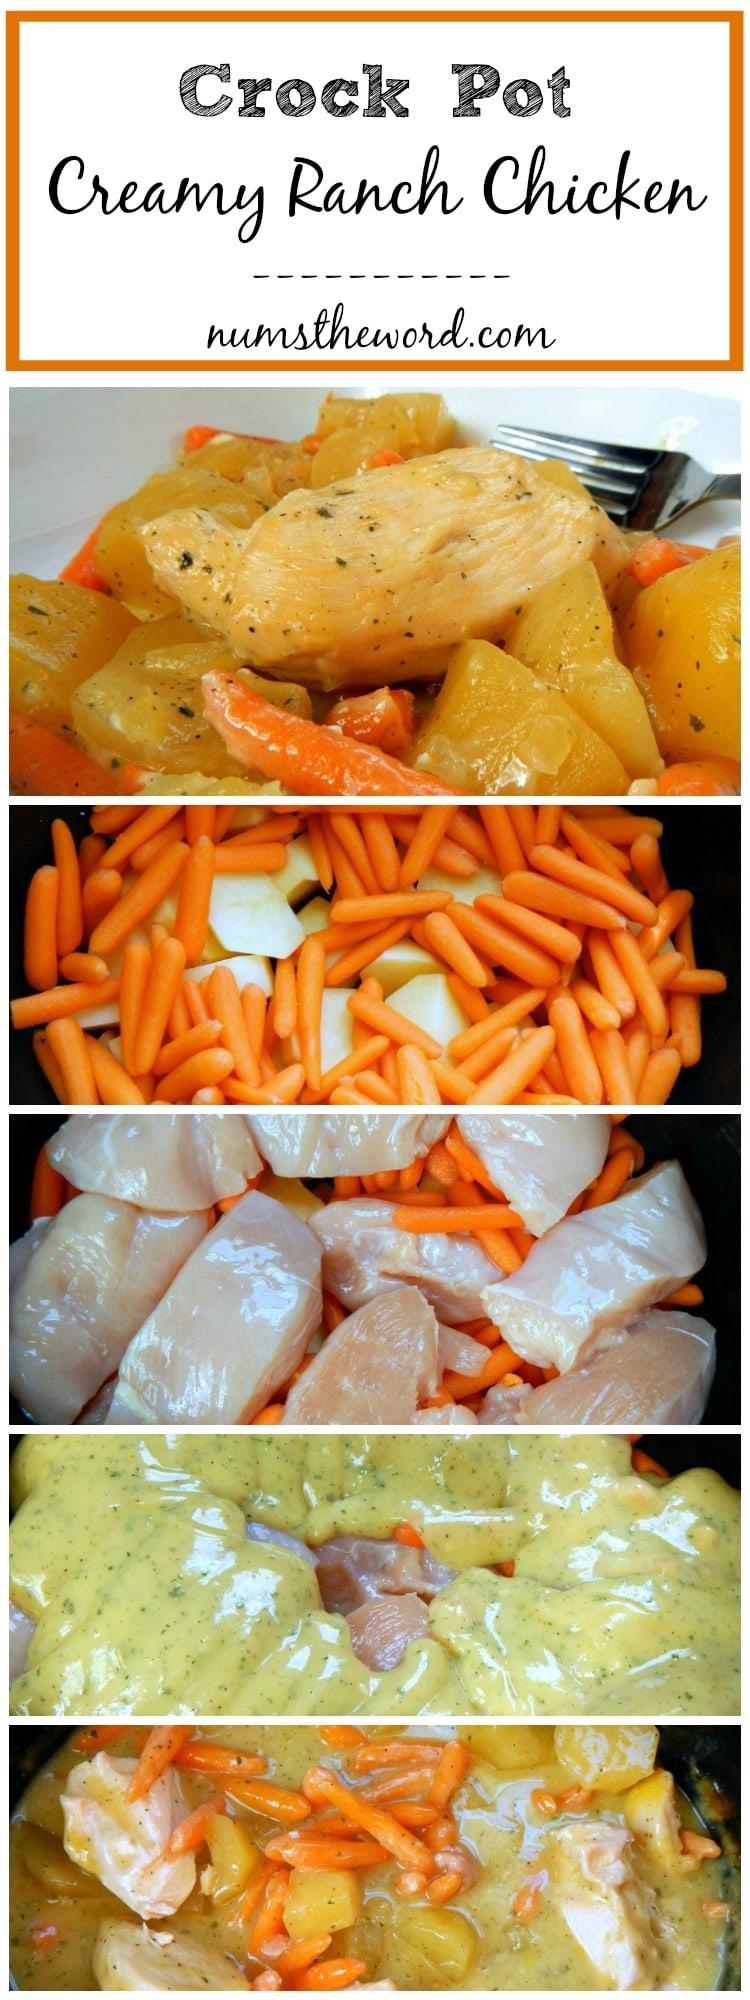 Crock Pot Creamy Ranch Chicken Numstheword